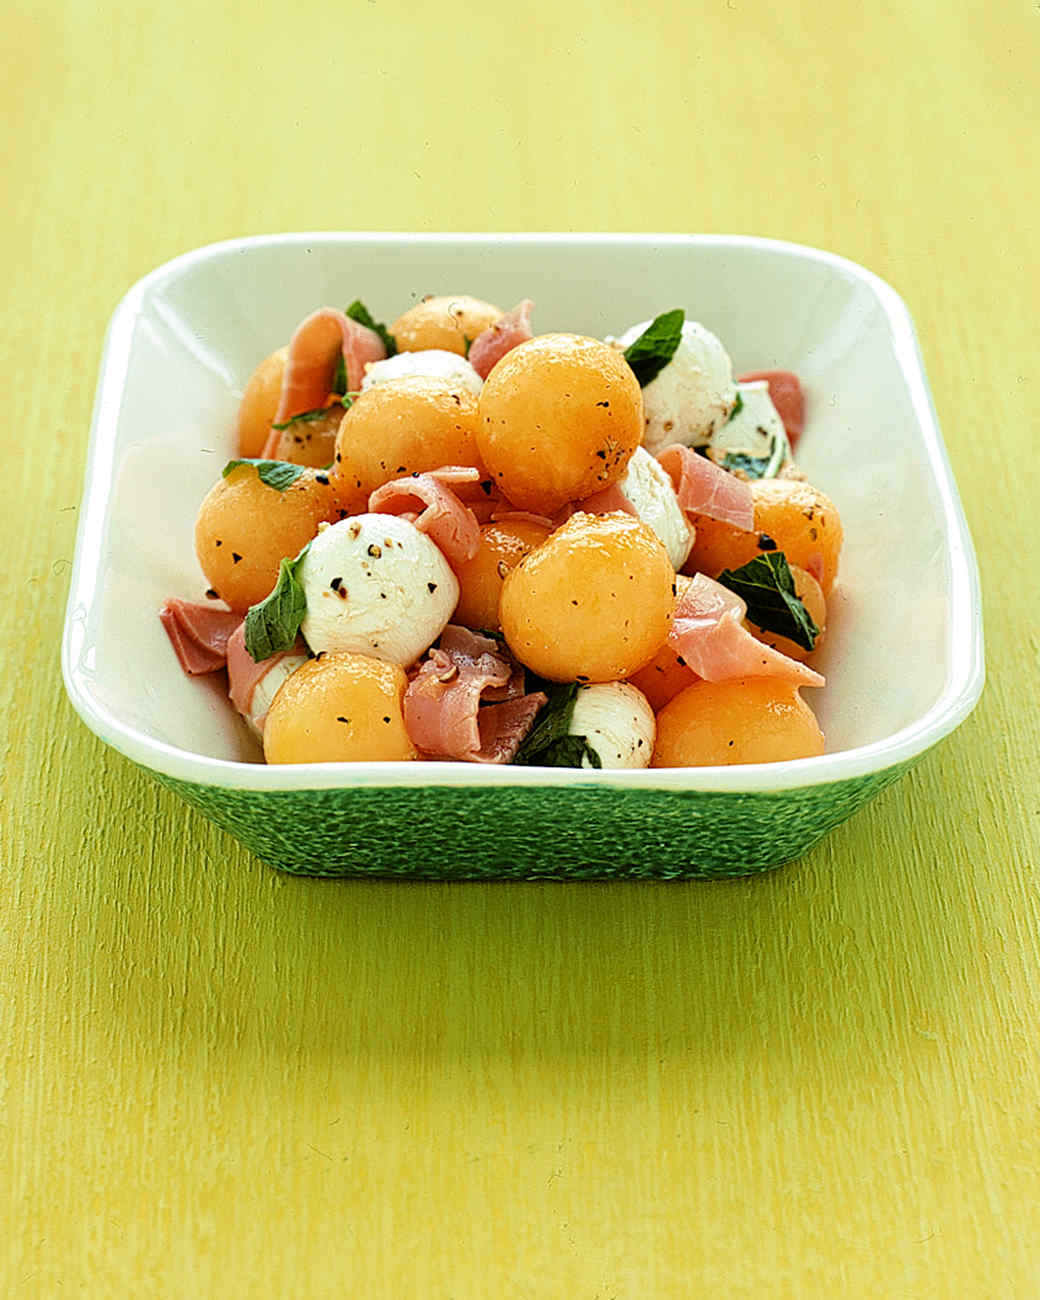 Cantaloupe and Bocconcini Salad with Mint